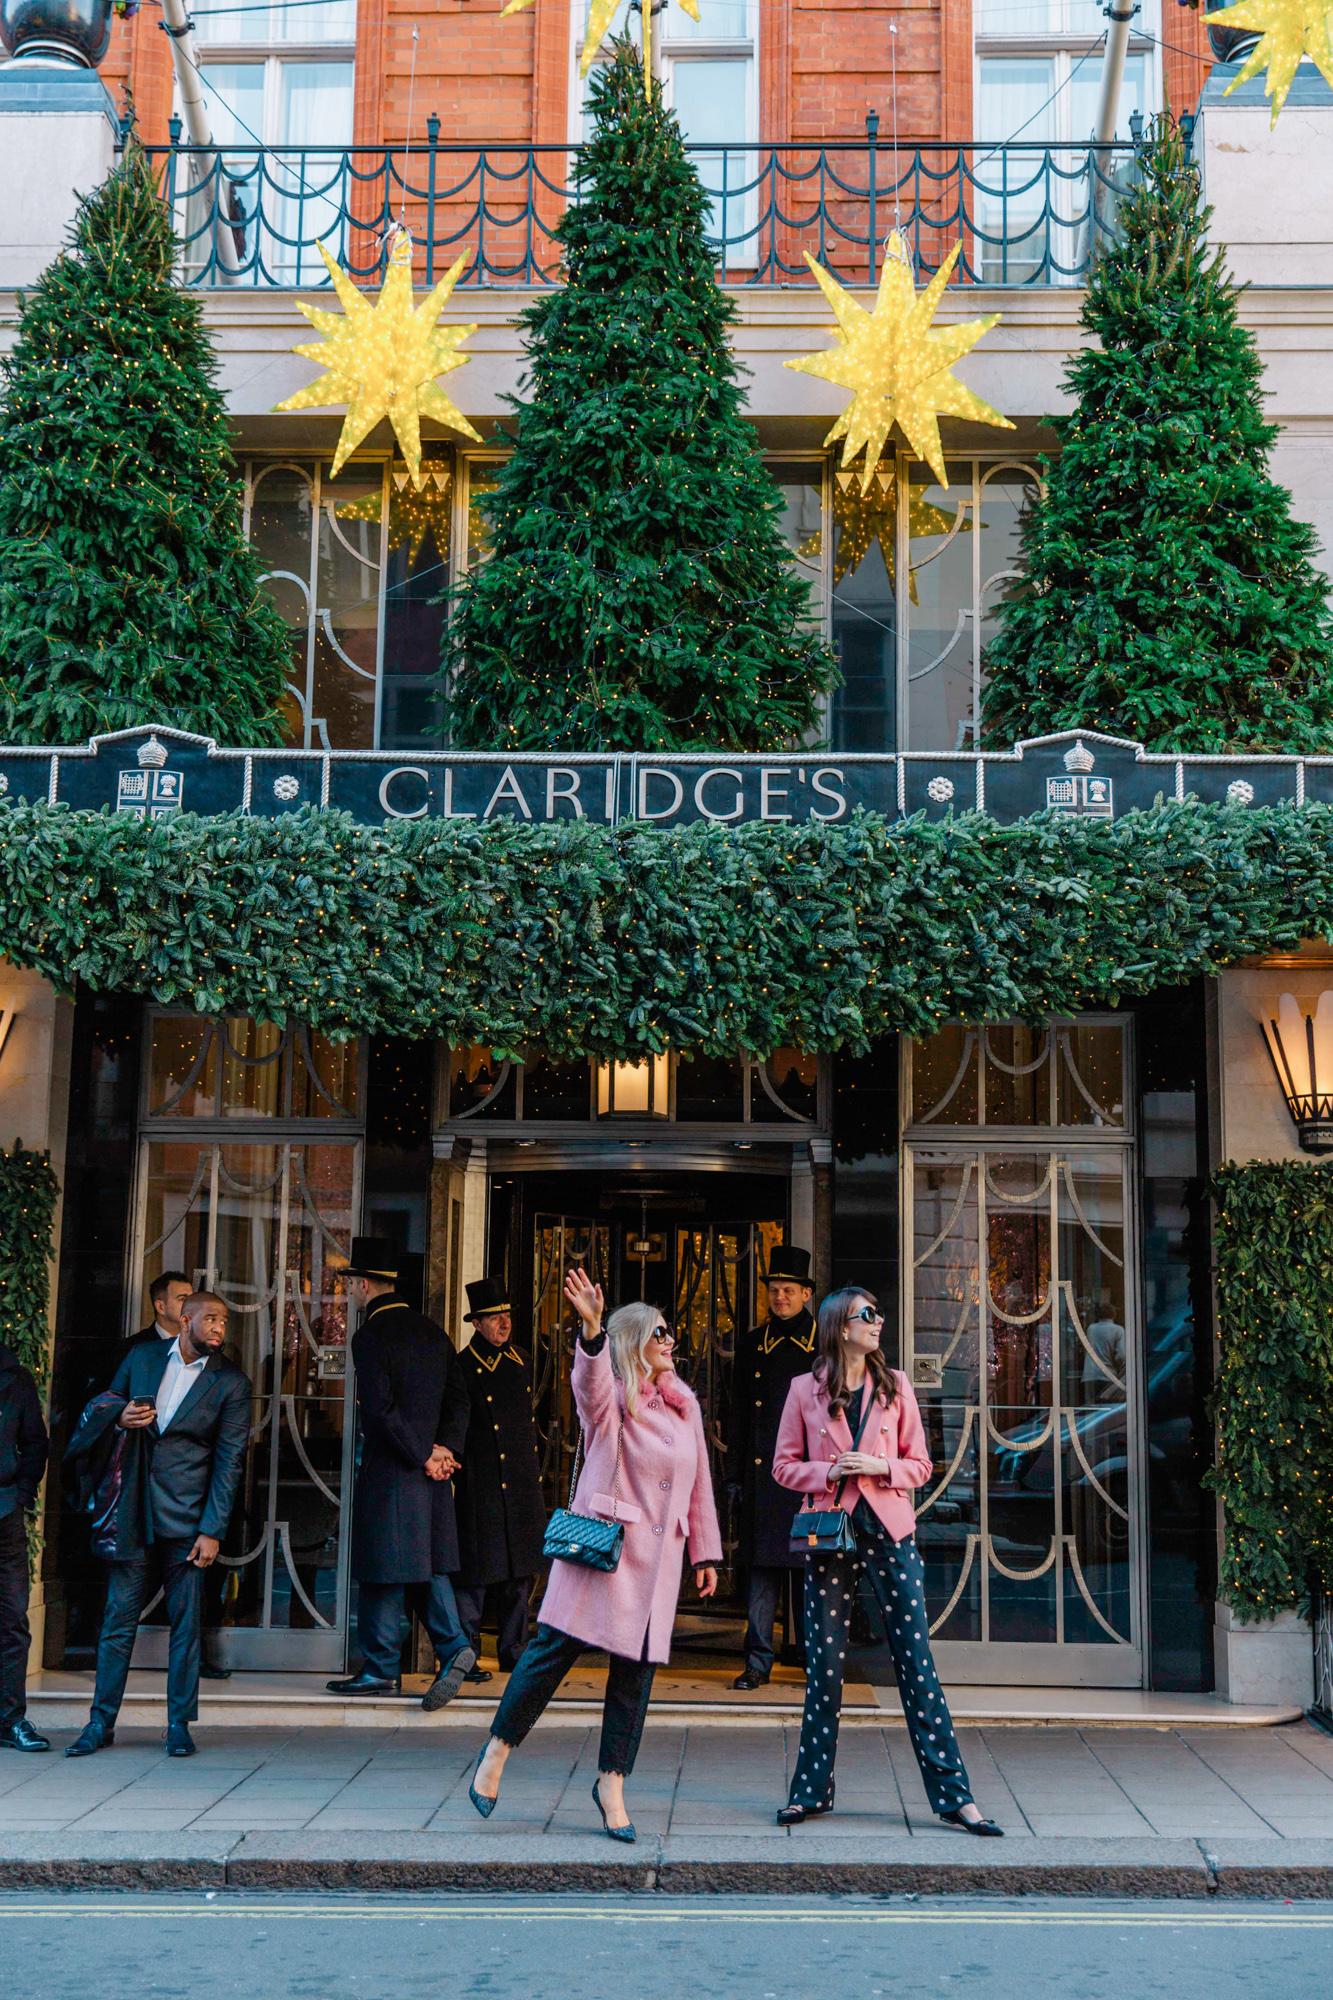 The Best Christmas Festive Decorations London-1.jpg